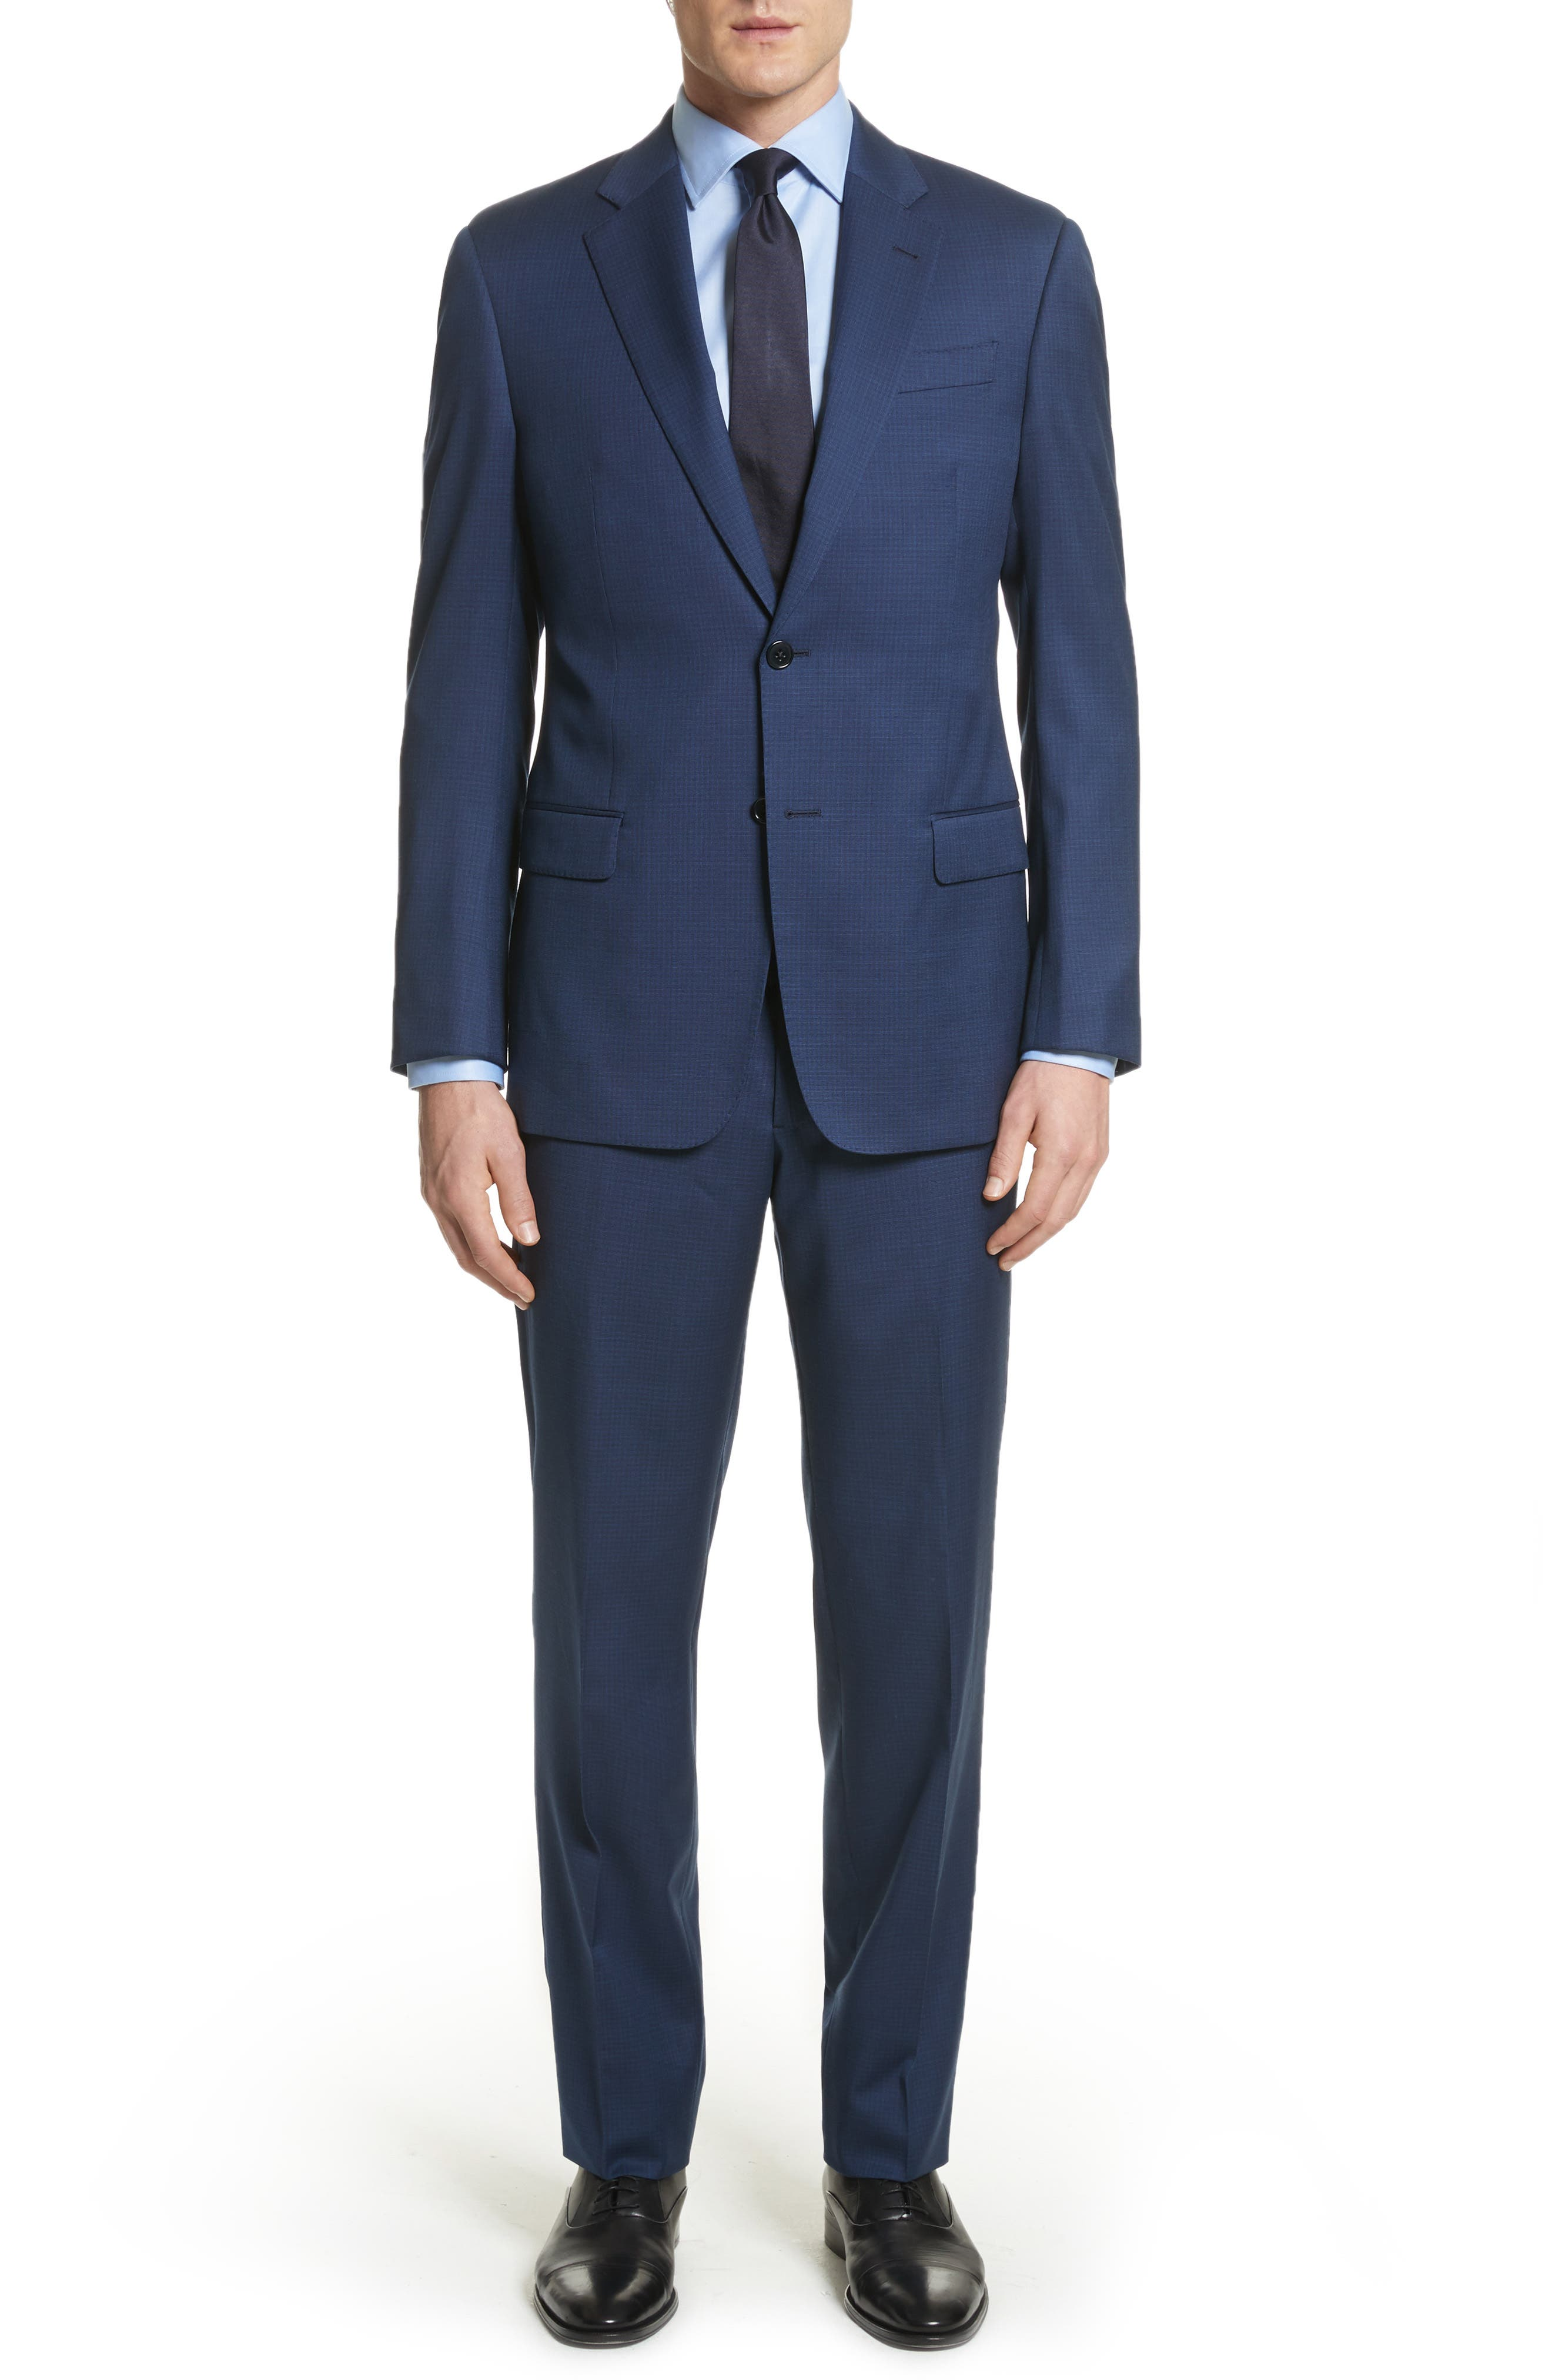 Main Image - Emporio Armani G Line Trim Fit Check Wool Suit